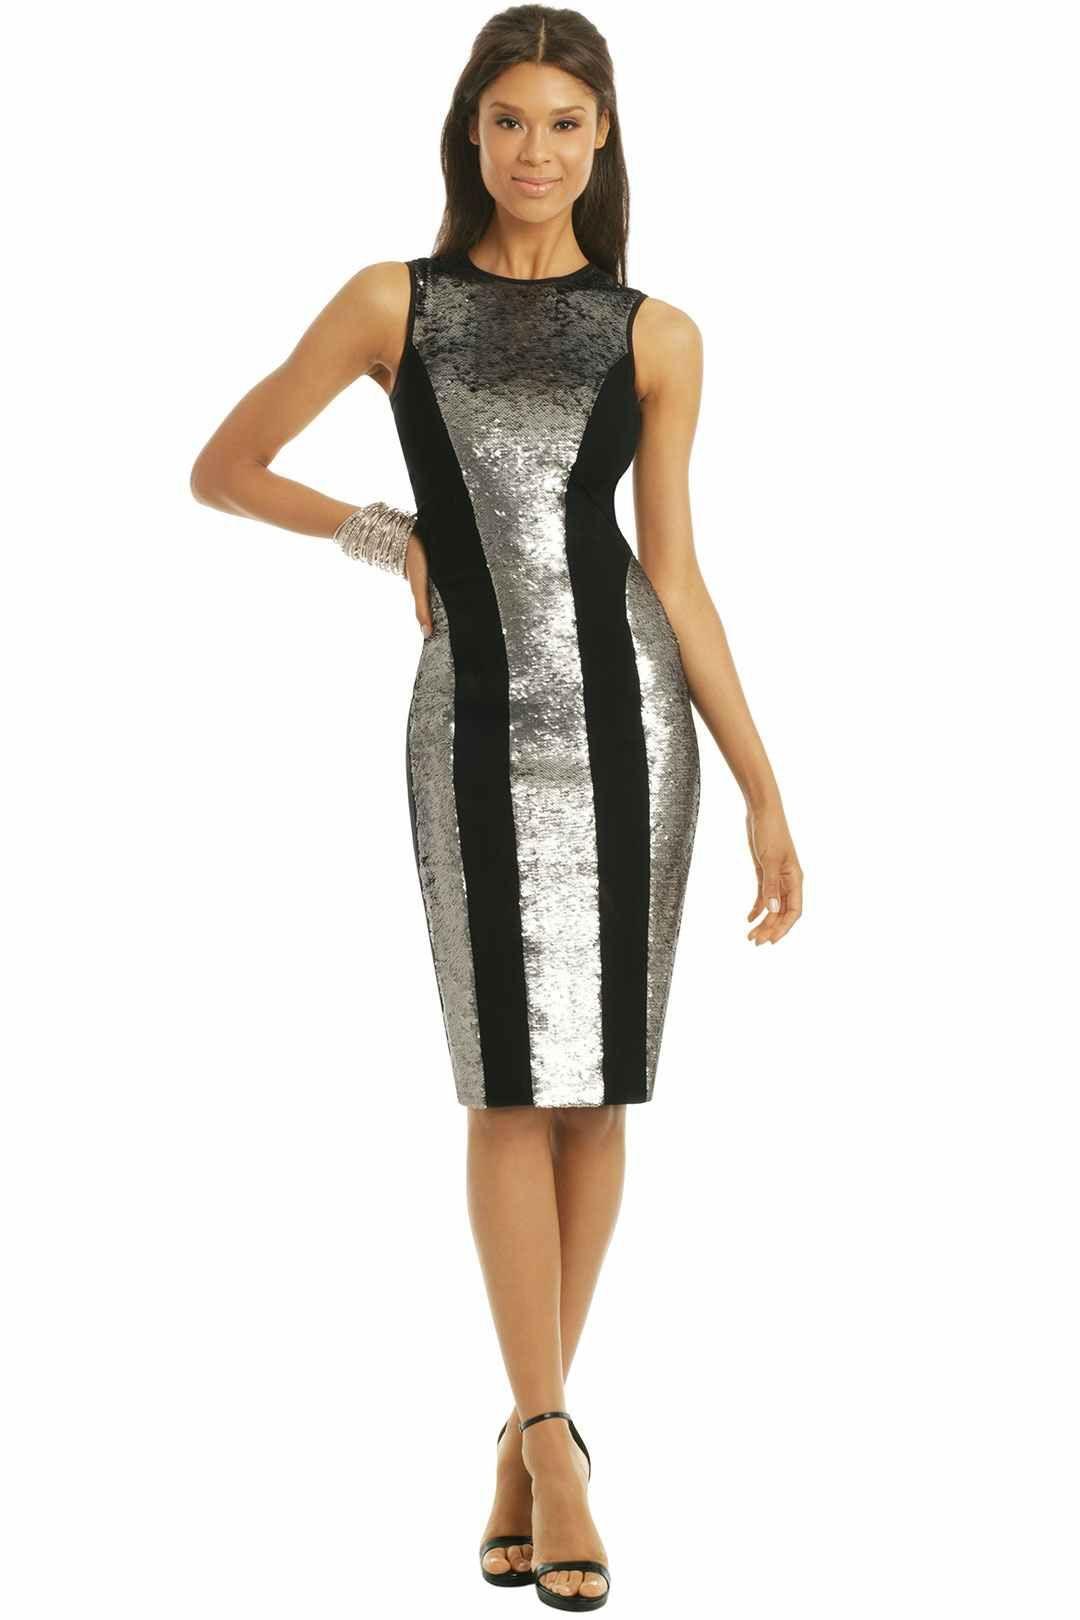 1a473f08f83 25 PLS17 Plein Sud Skip A Beat Sheath  RentTheRunway  Fashion Trending  Designer Dresses  EveningWear  PromDress  DateNightDress  PartyDress   CocktailDress ...